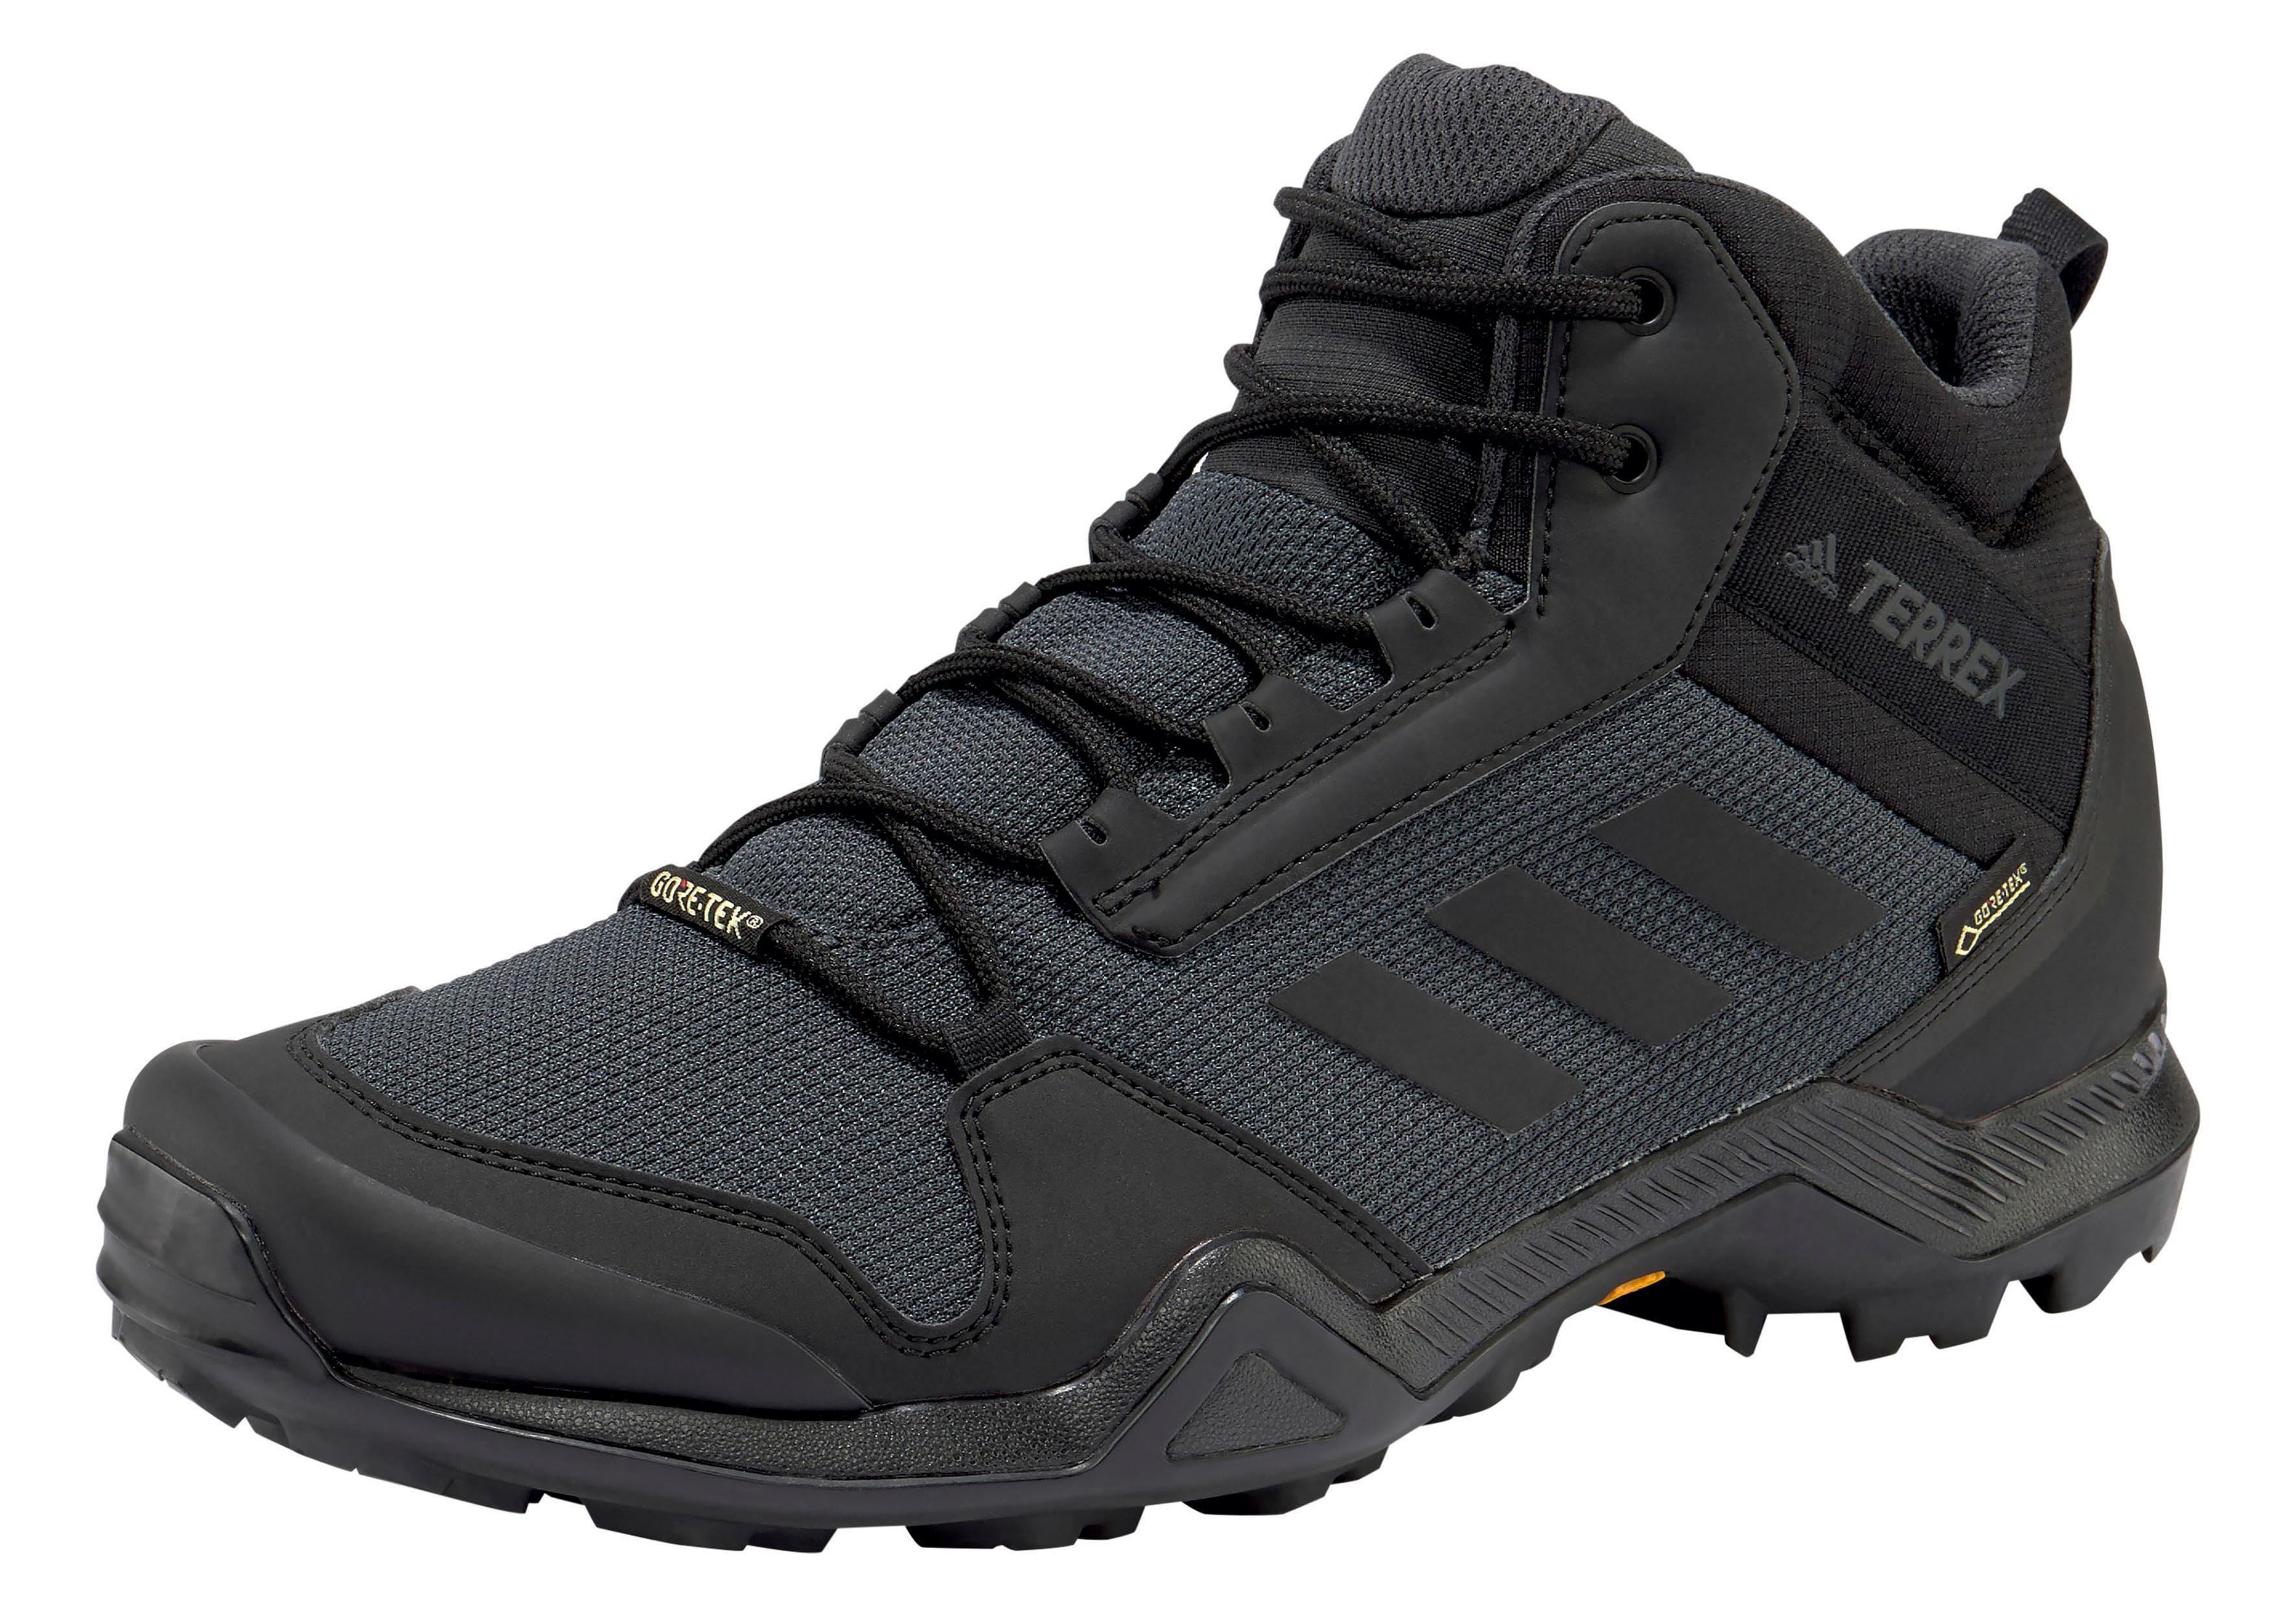 adidas Performance outdoorschoenen »Terrex AX3 Mid Gortex«